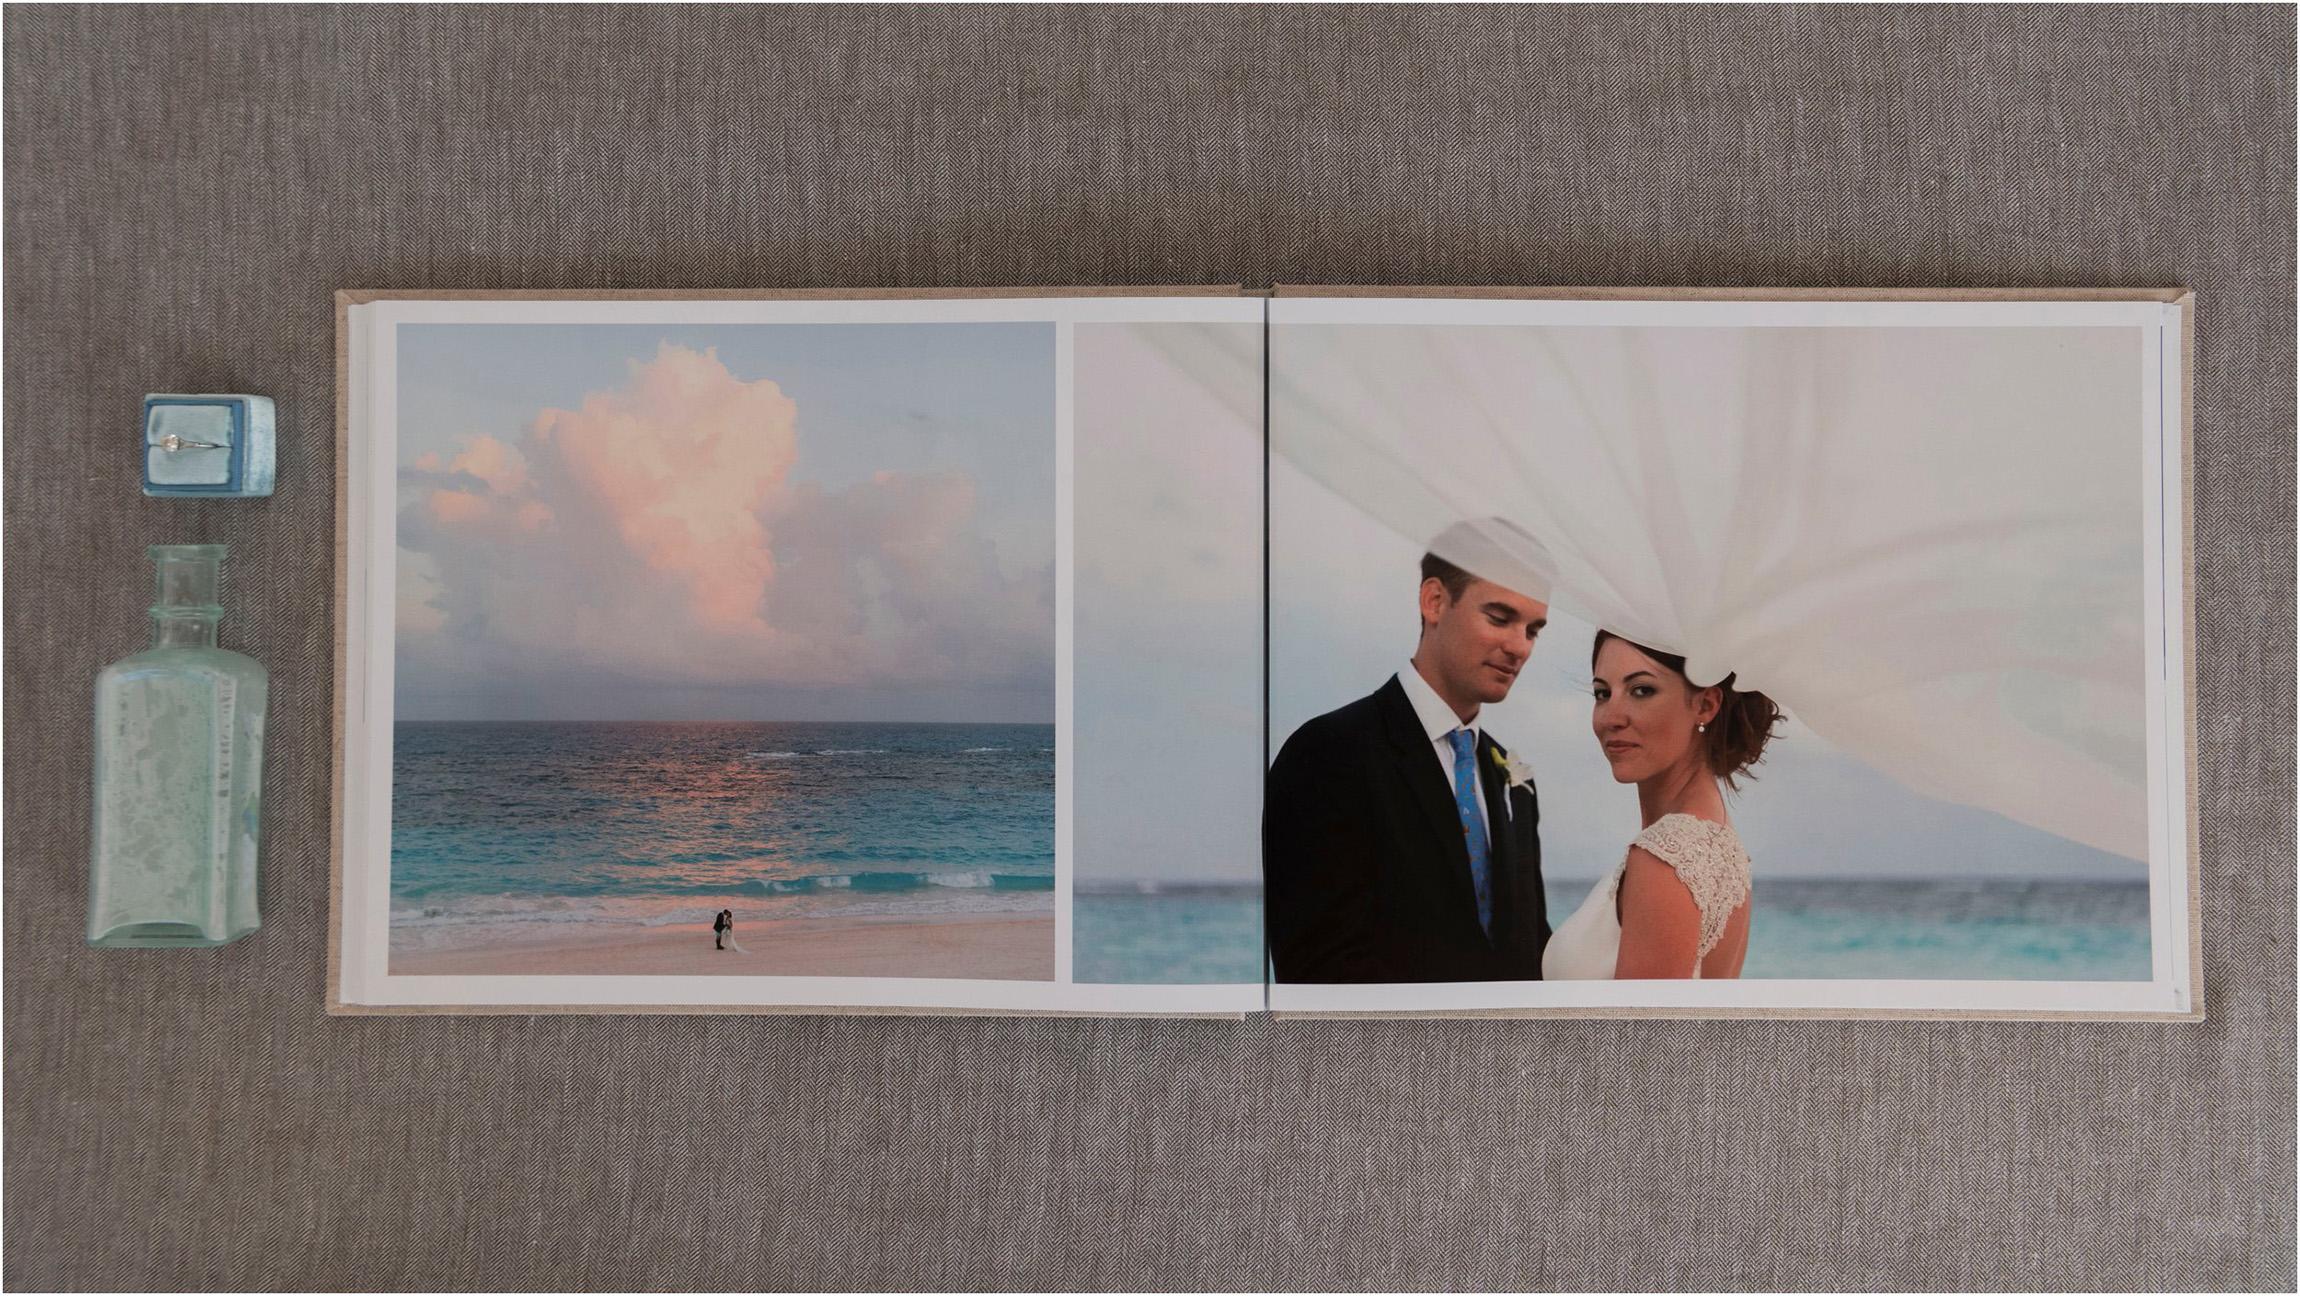 ©FianderFoto_Destination Wedding Photographer_Wedding Album_011.jpg